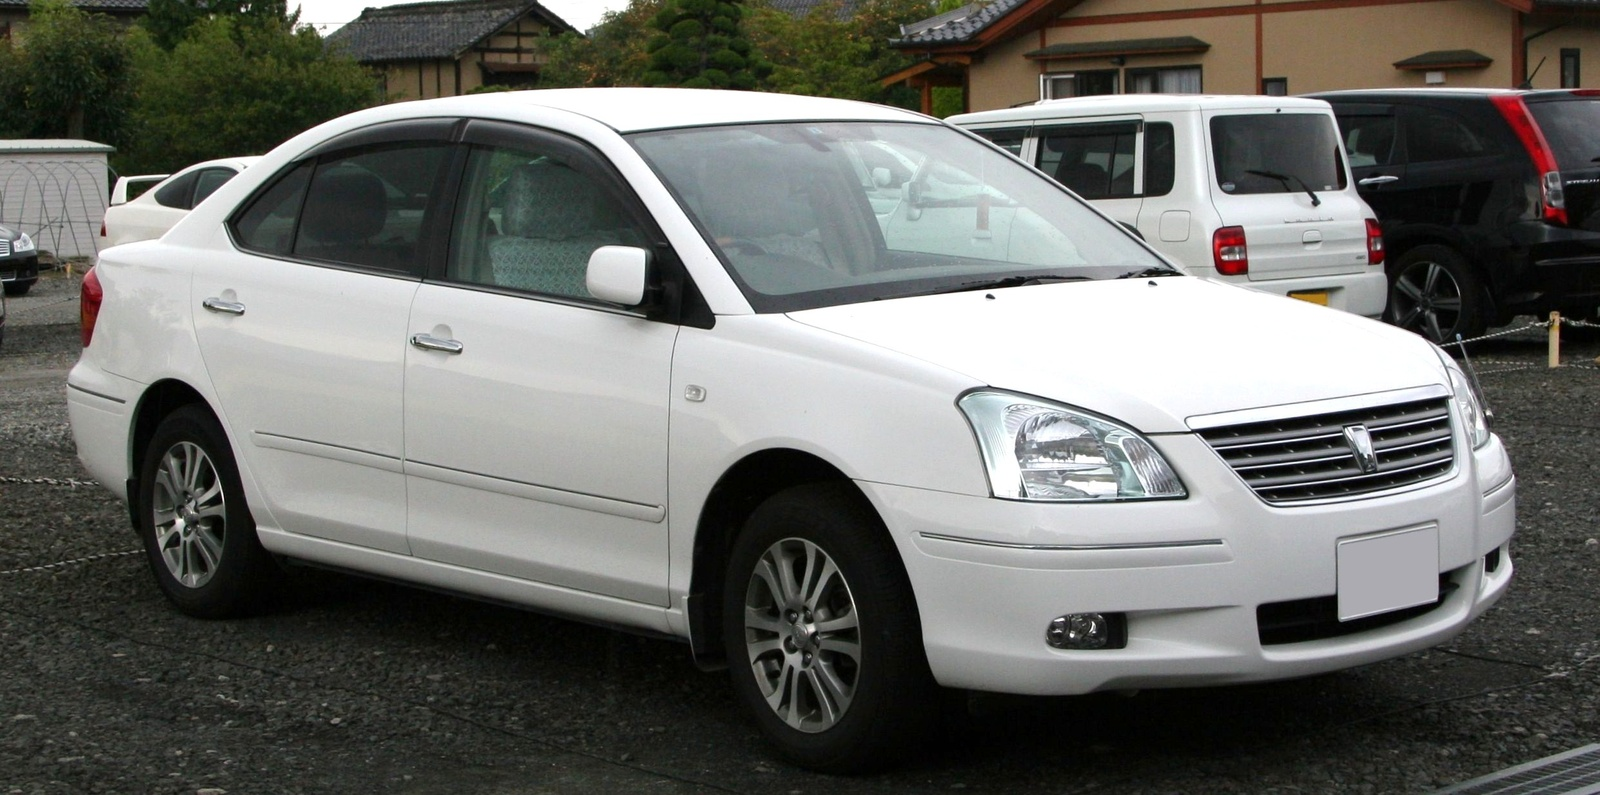 Toyota corolla questions cause of white smoke emmission cargurus mark helpful vanachro Choice Image